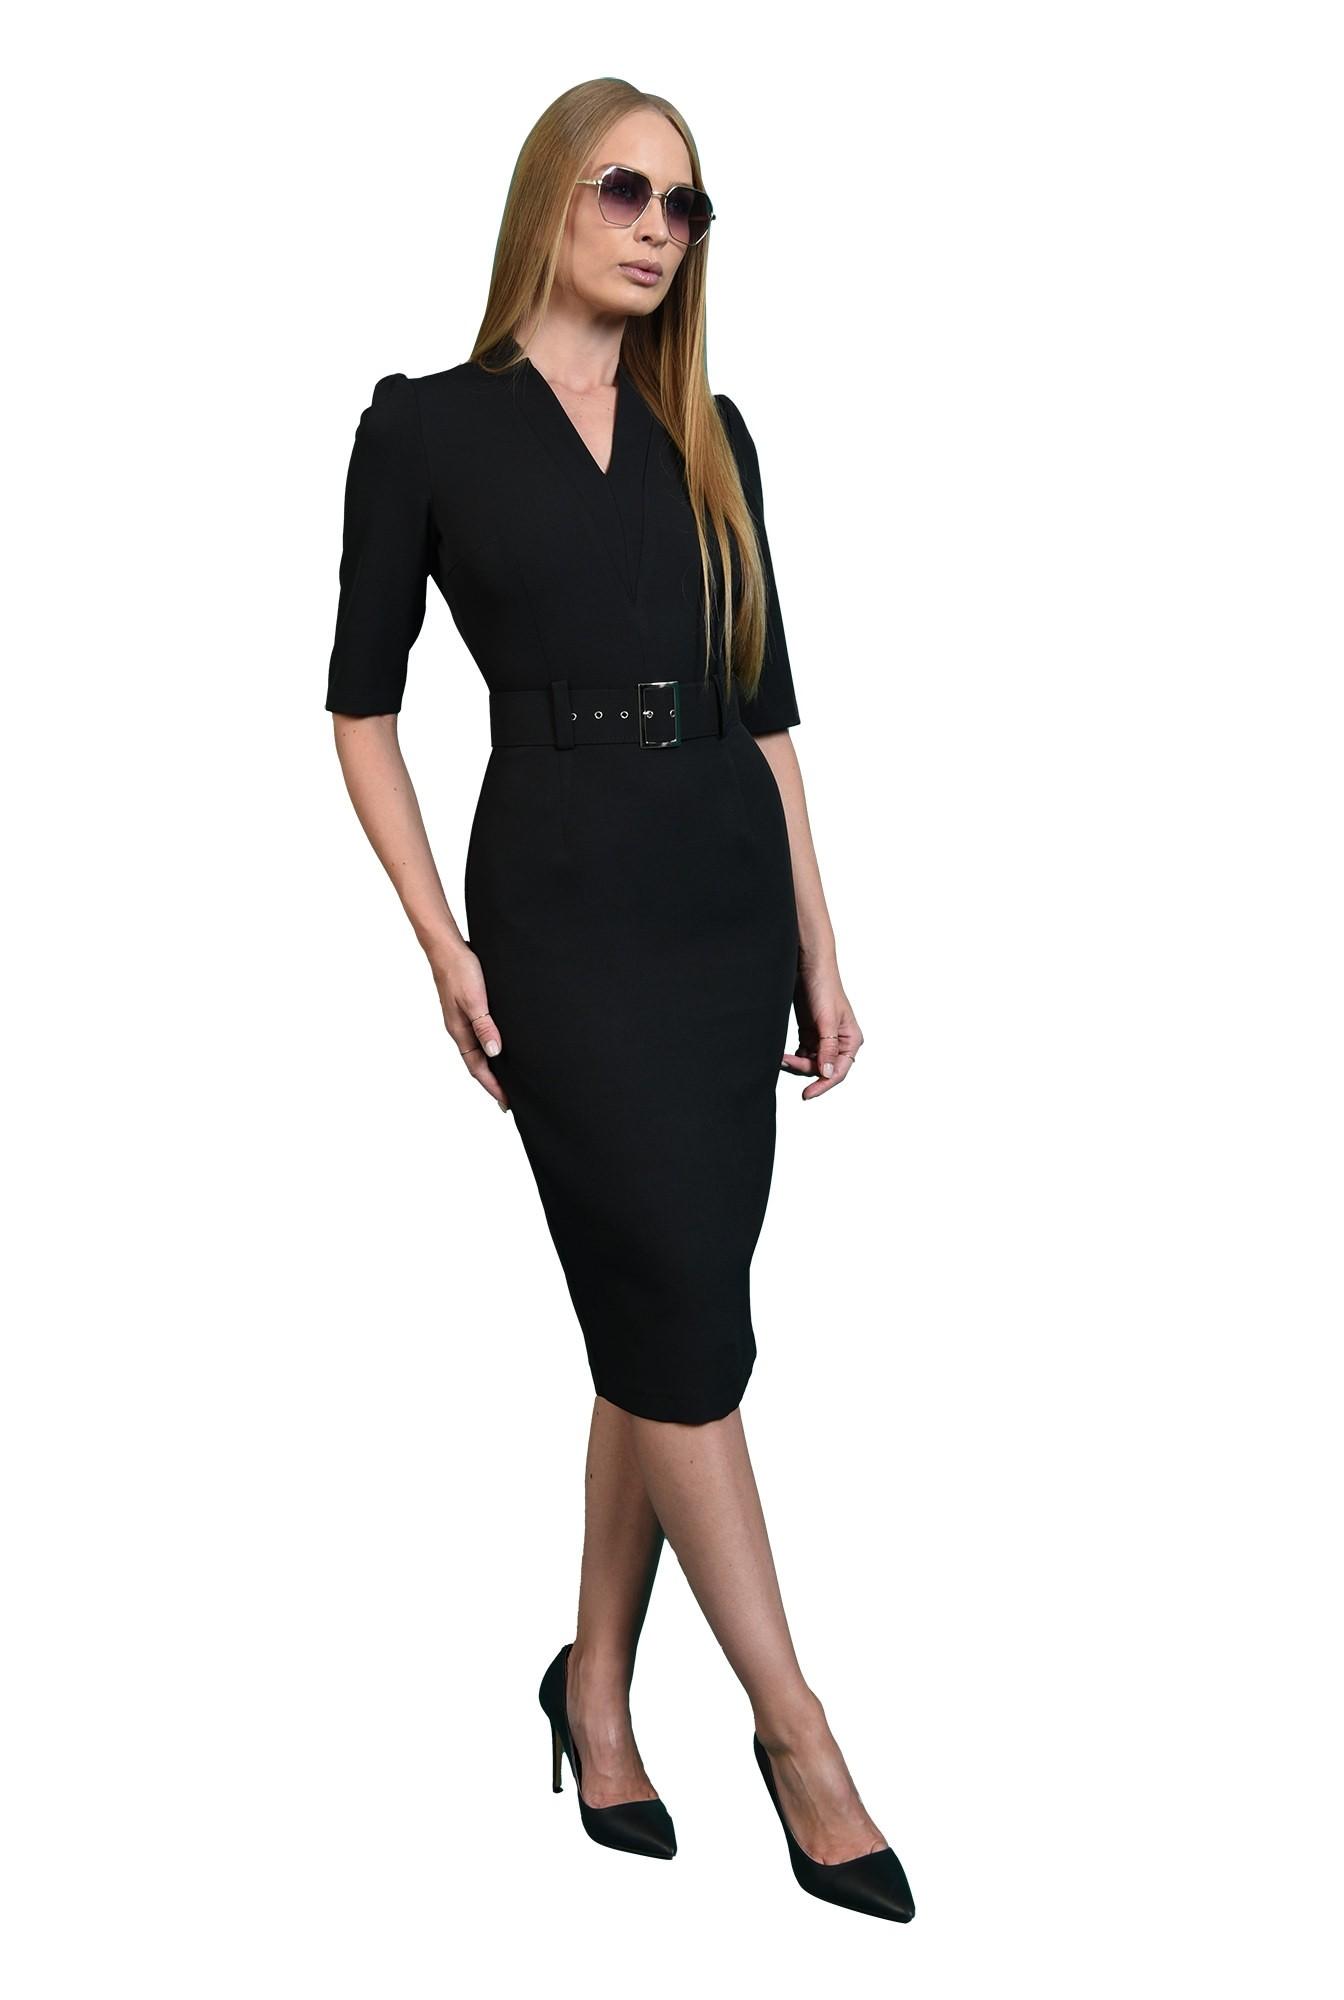 3 - rochie neagra, conica, cu revere crestate